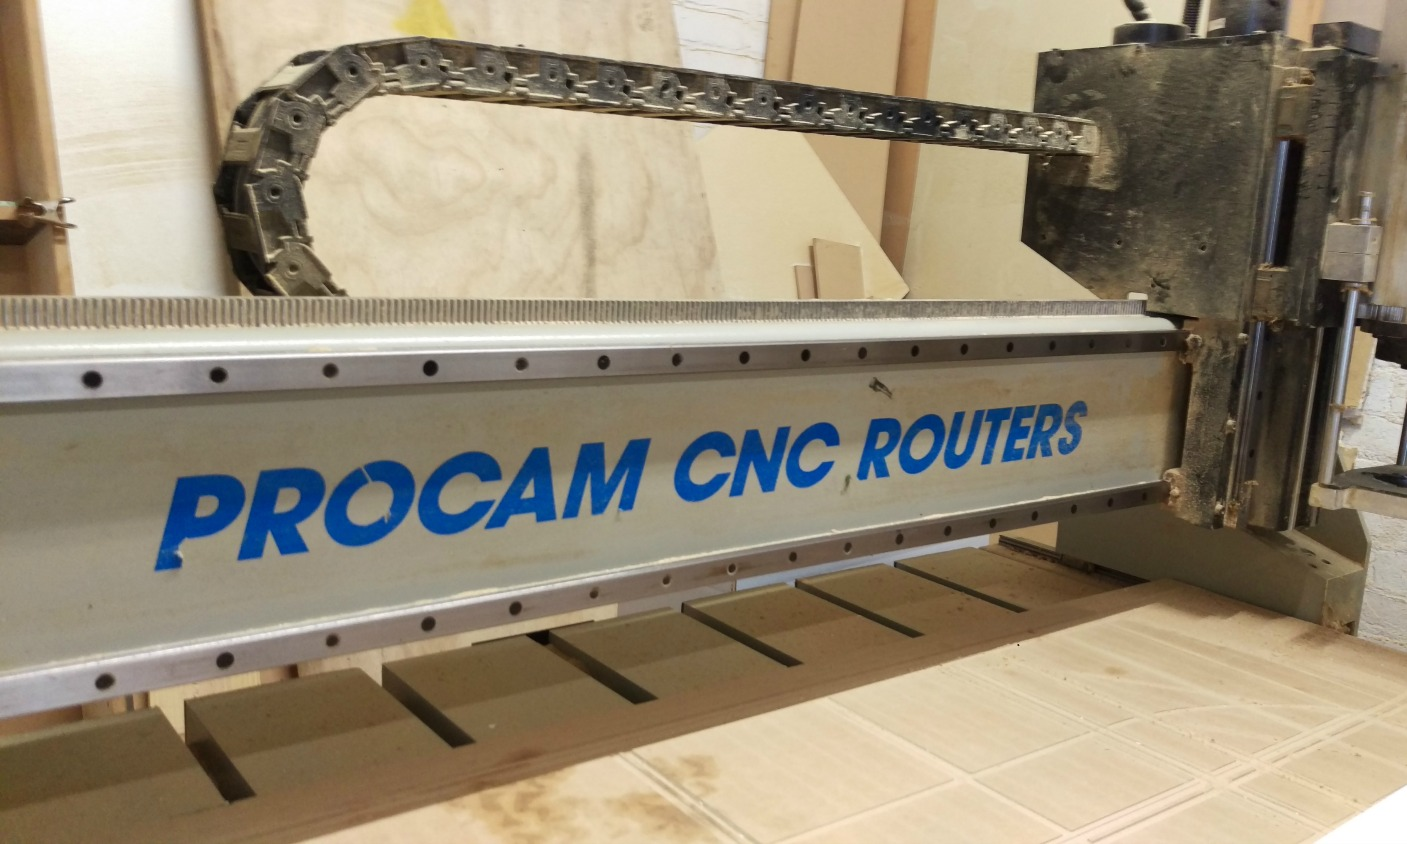 Procam CNC Router.jpg